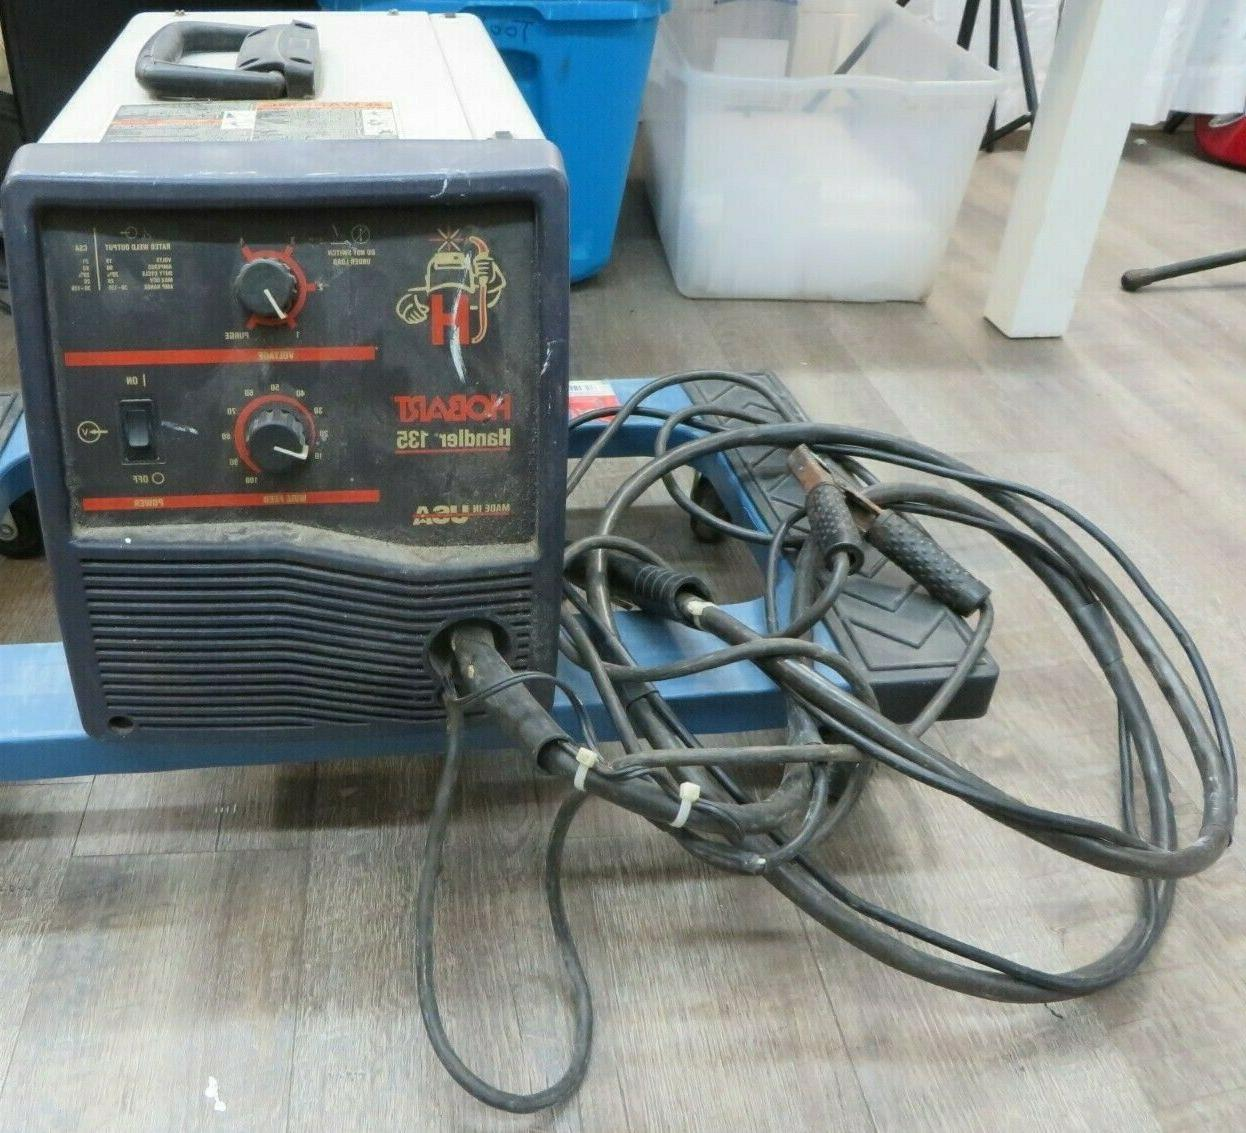 handler 135 wired feed welder 115v 20amps